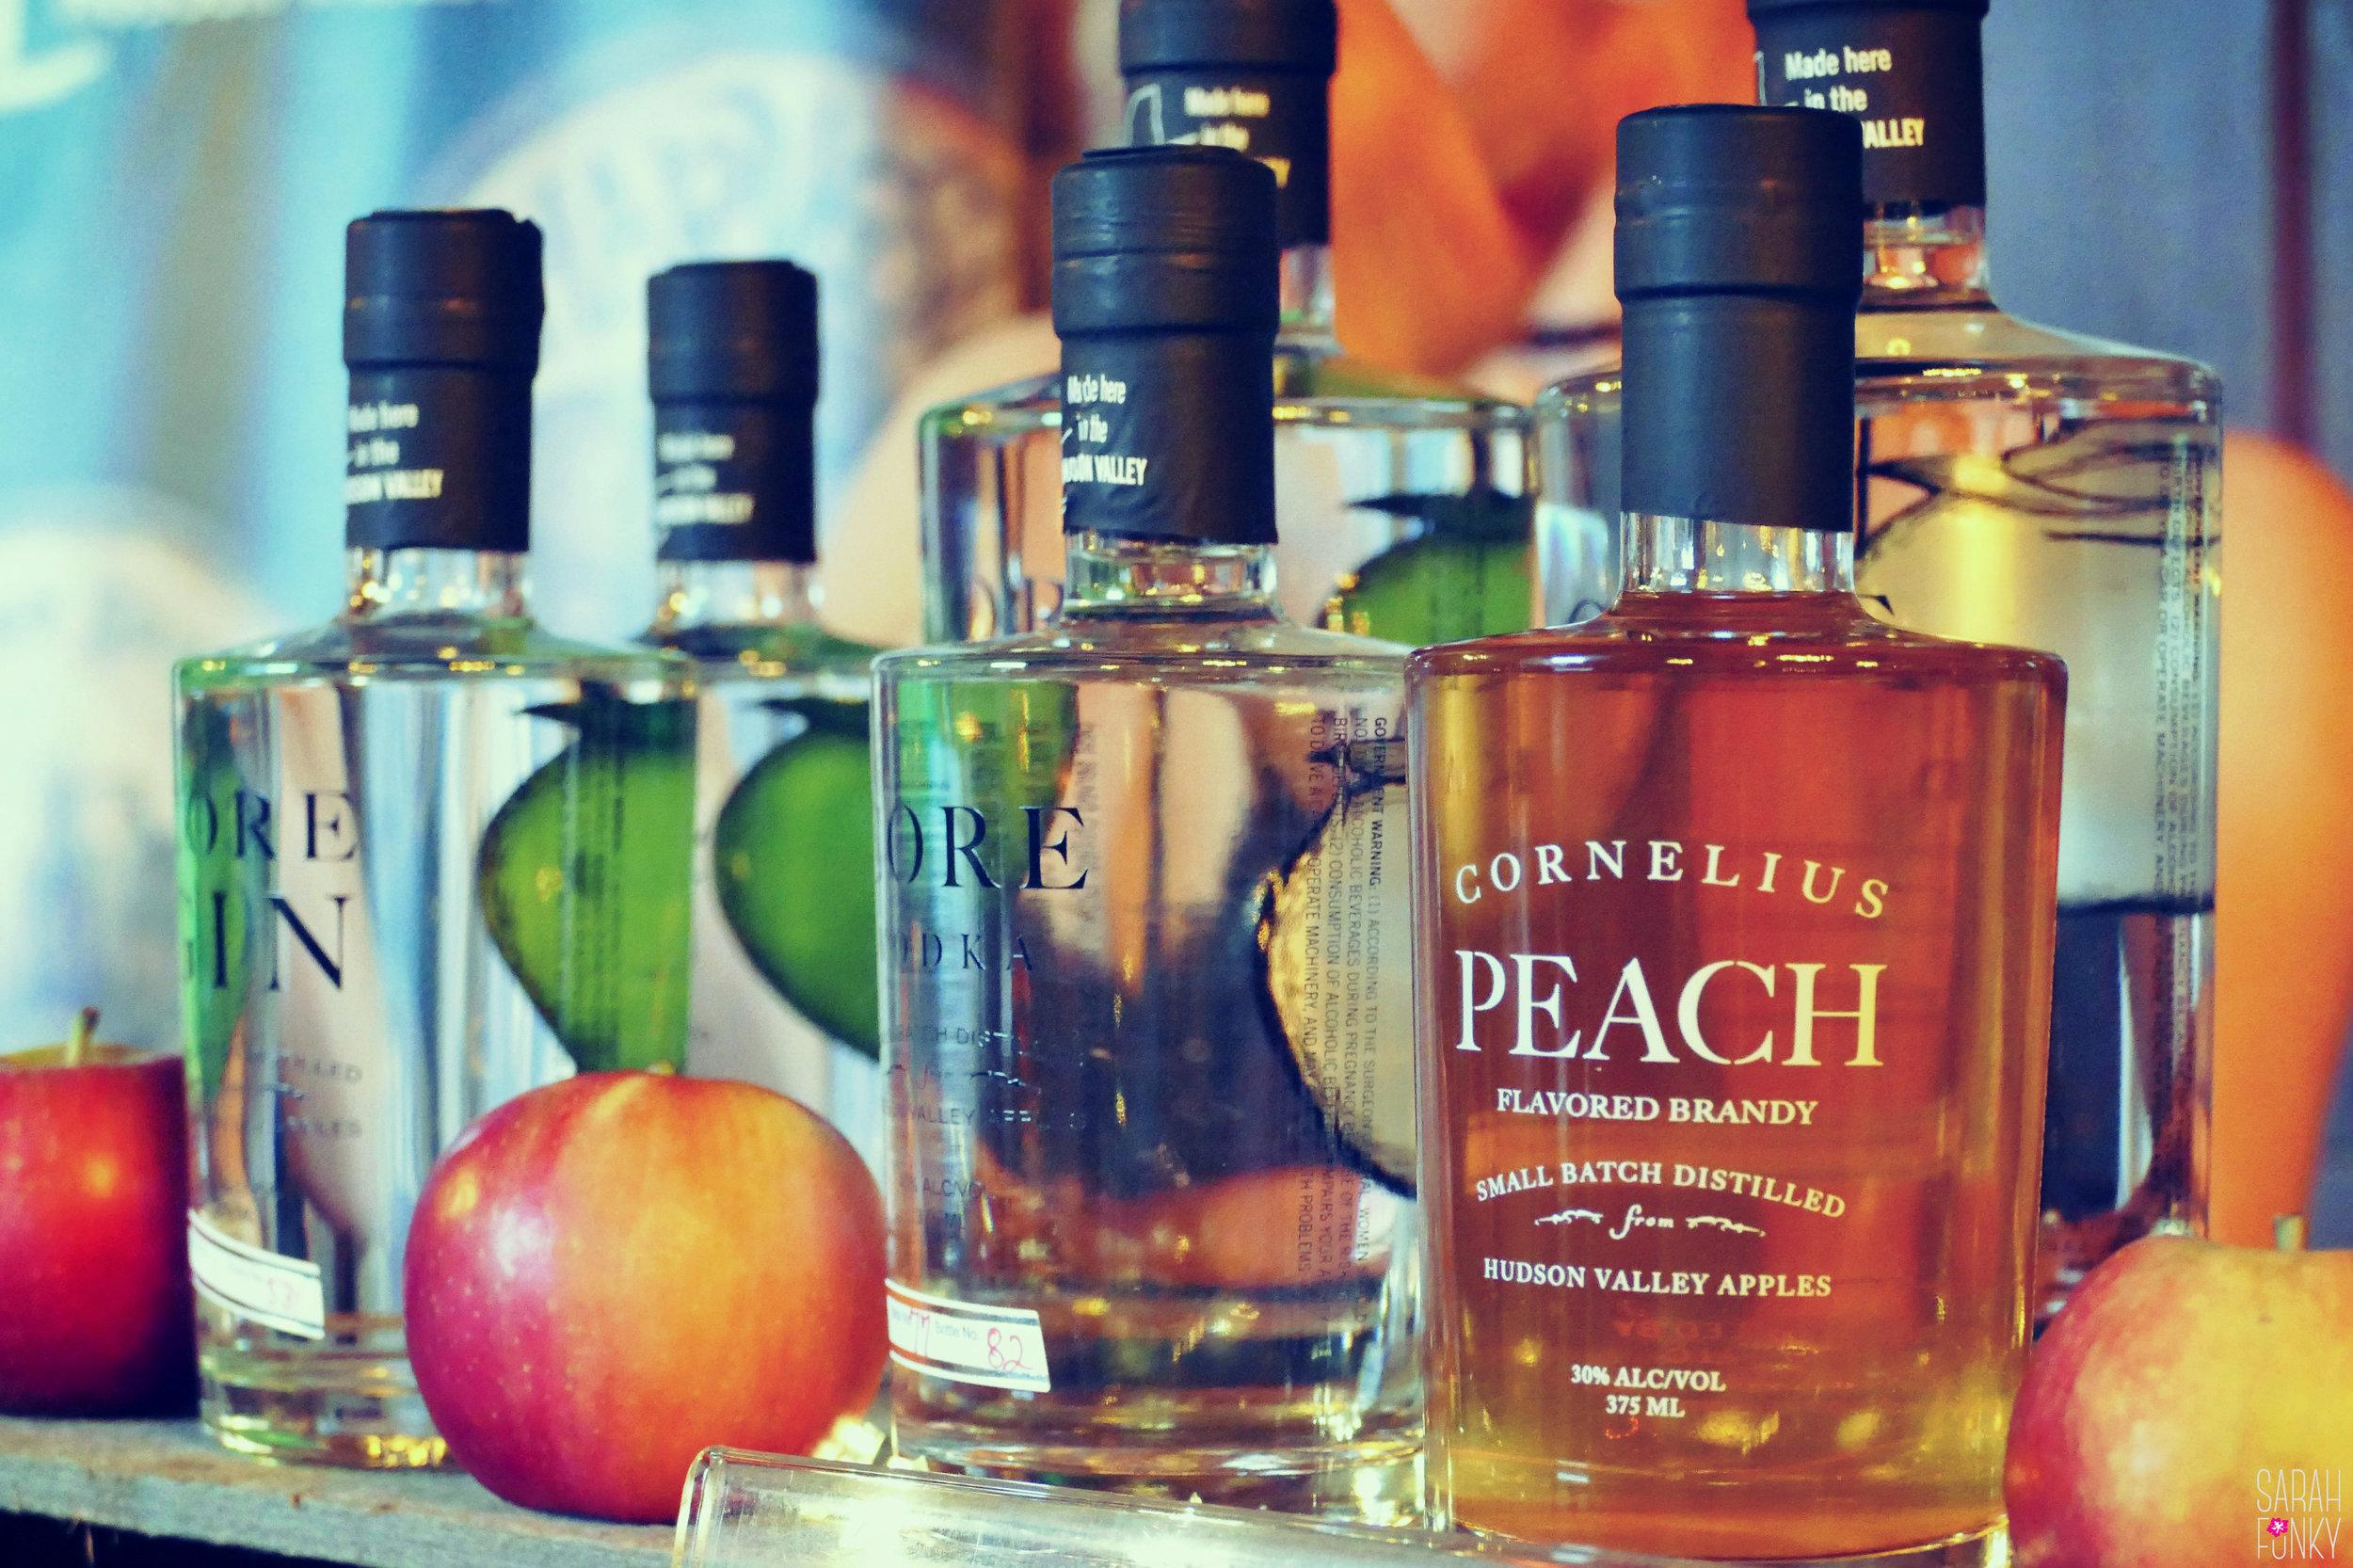 Harvest Spirits Distillery's Core Vodka and Peach Brandy